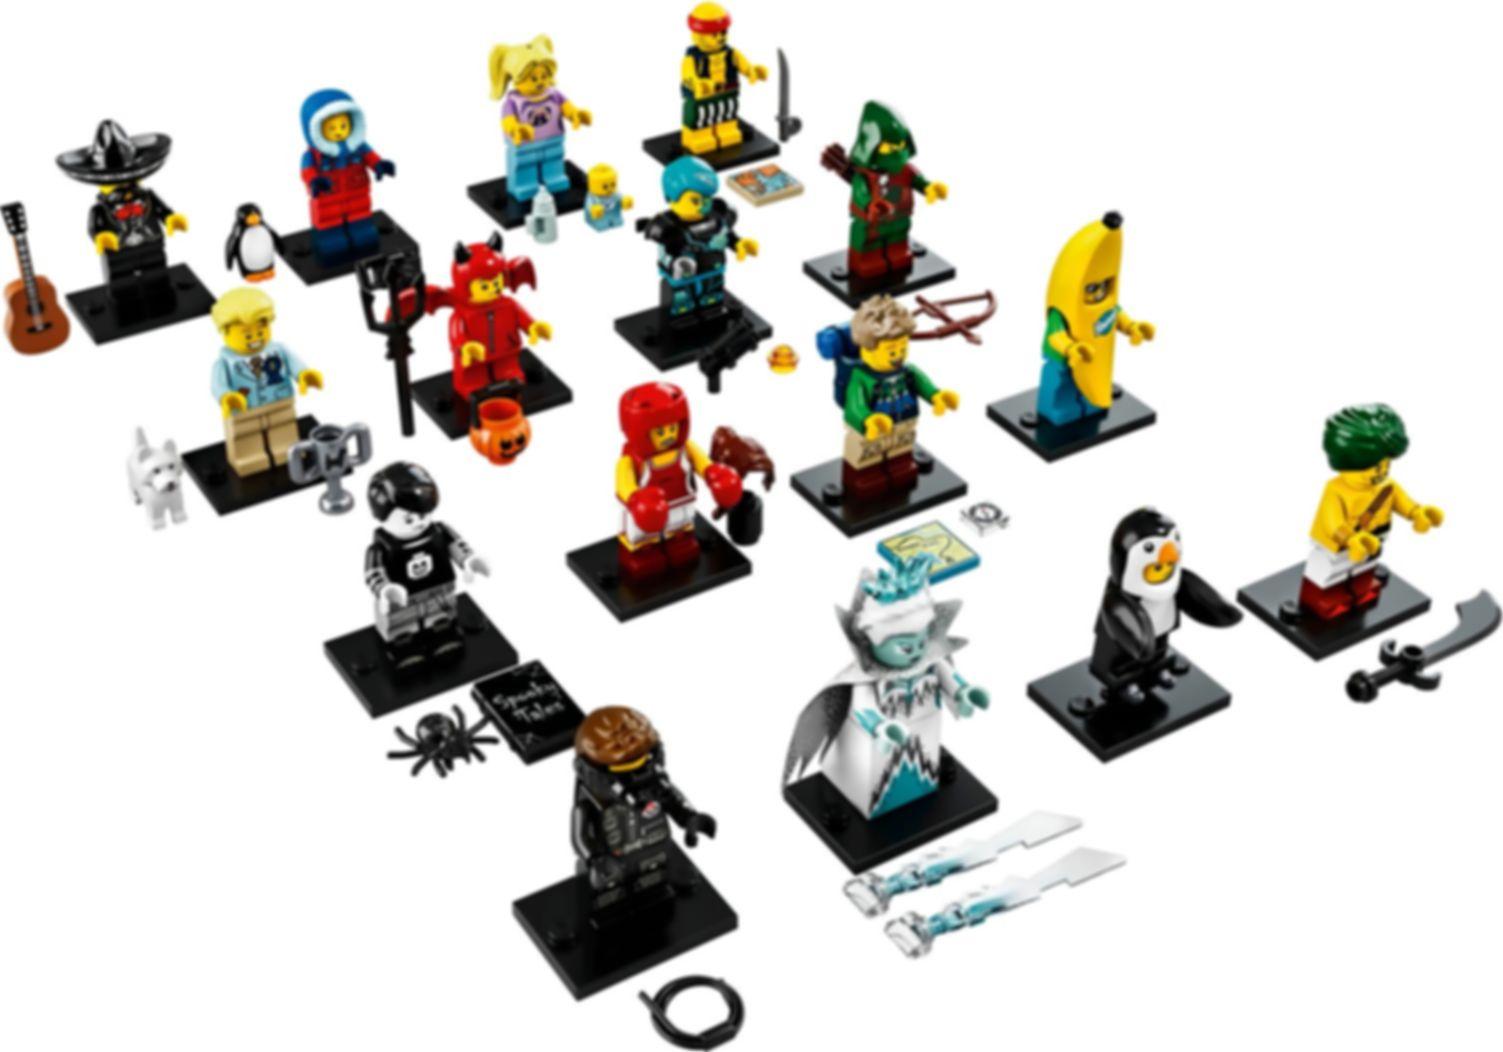 Series 16 minifigures